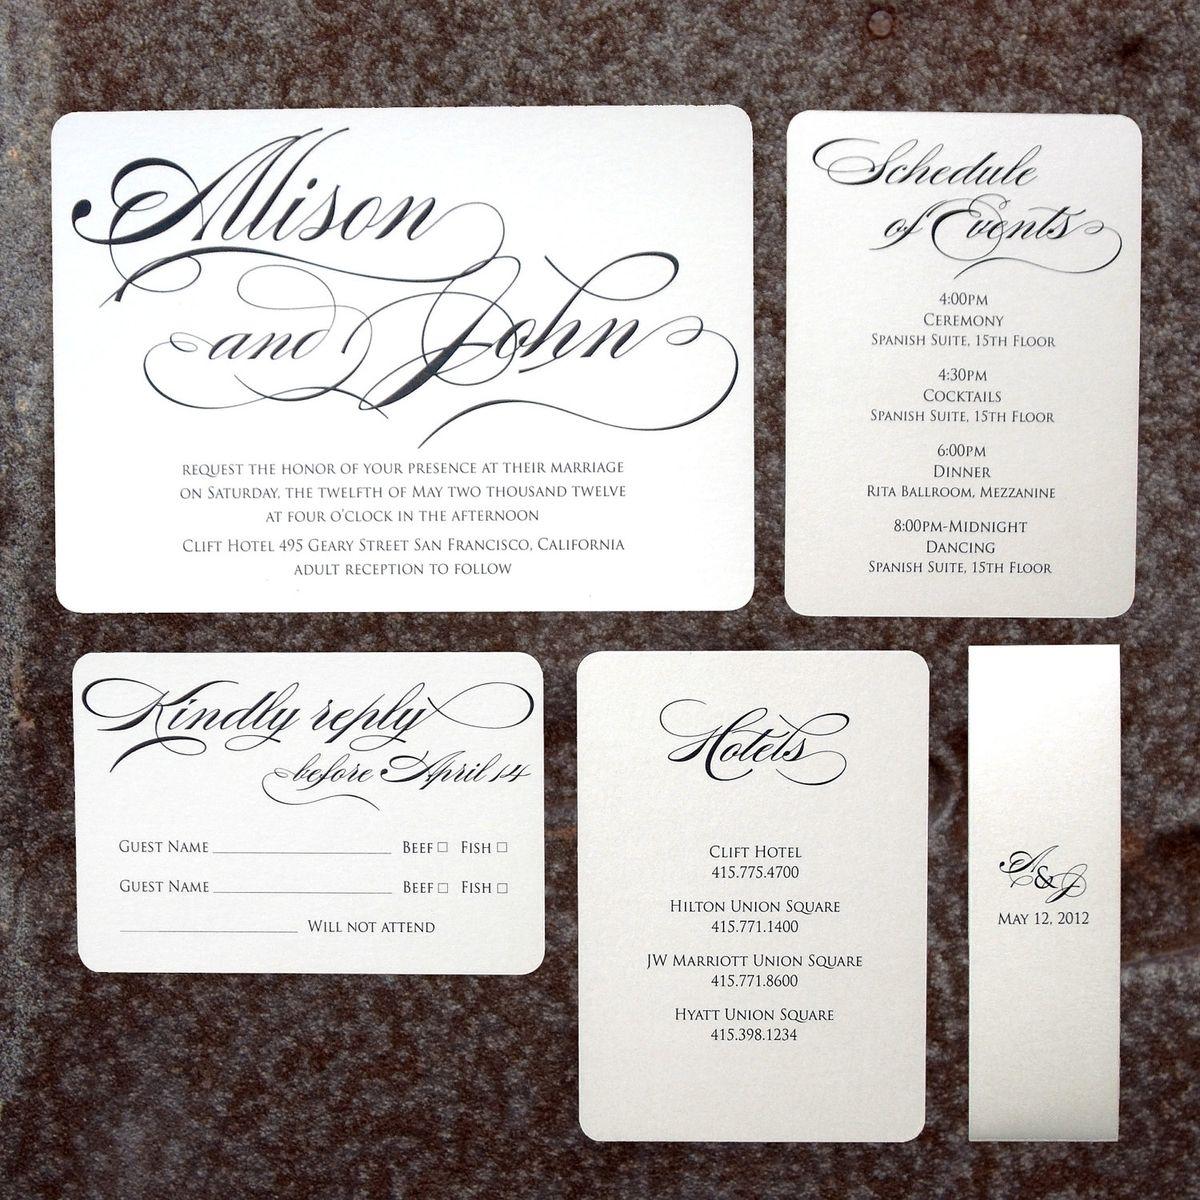 Custom Made The Allison Set - Modern Formal Wedding Invitation ...